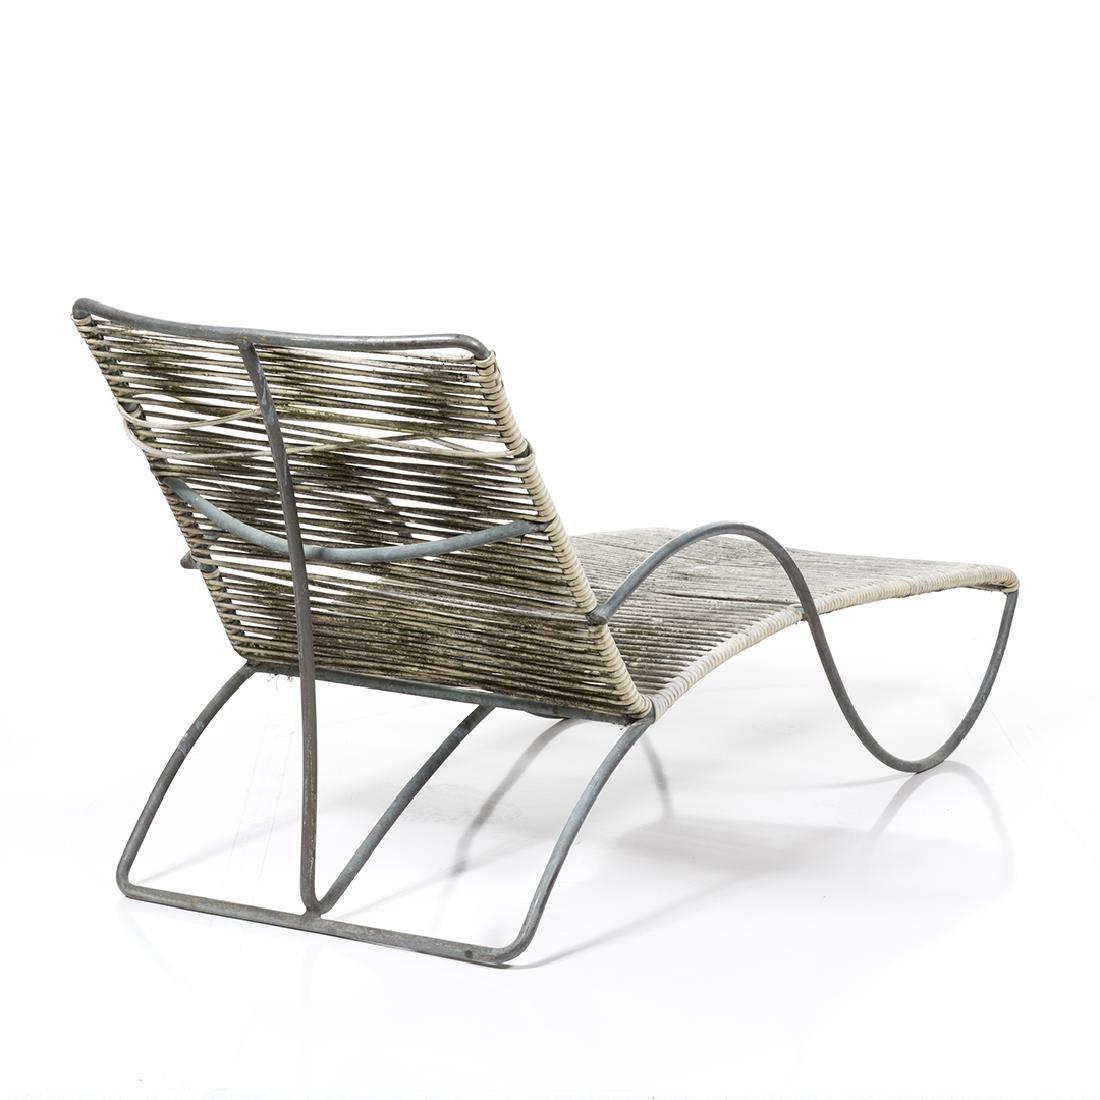 Walter Lamb Chaise Lounge - 4